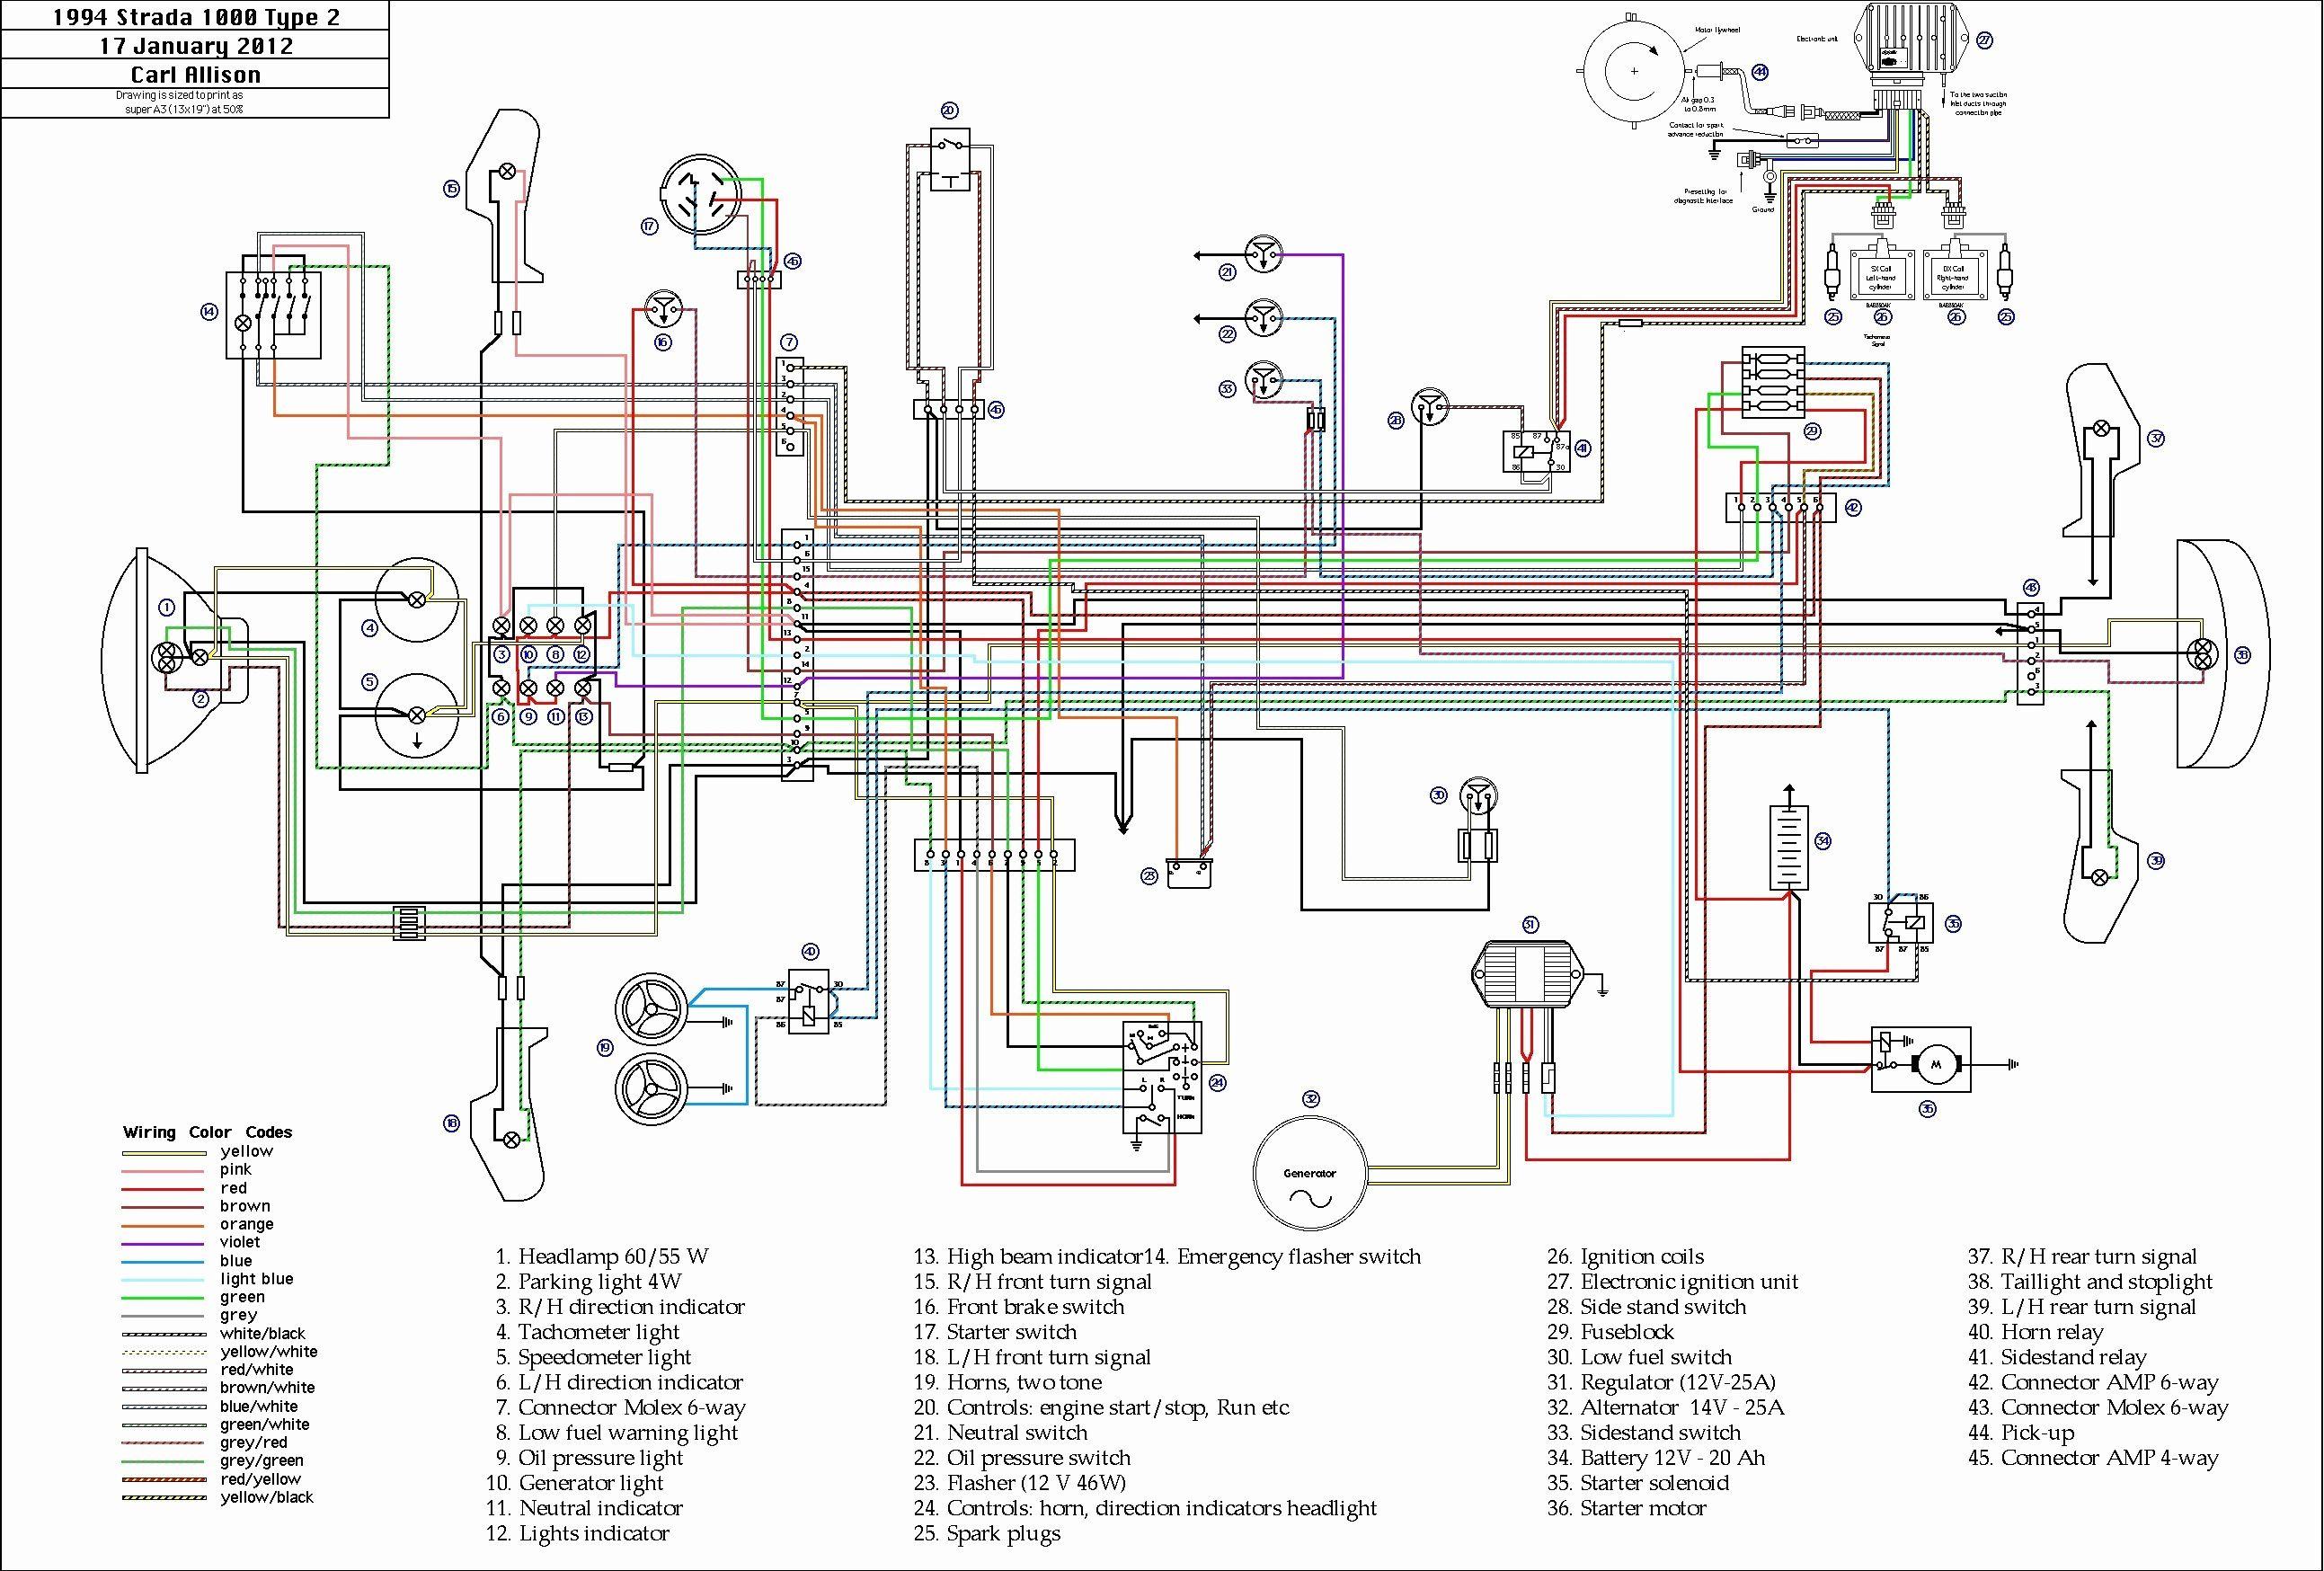 6 Volt Buick Generator Voltage Regulator Wiring Diagram Unique Type - 12 Volt Generator Voltage Regulator Wiring Diagram